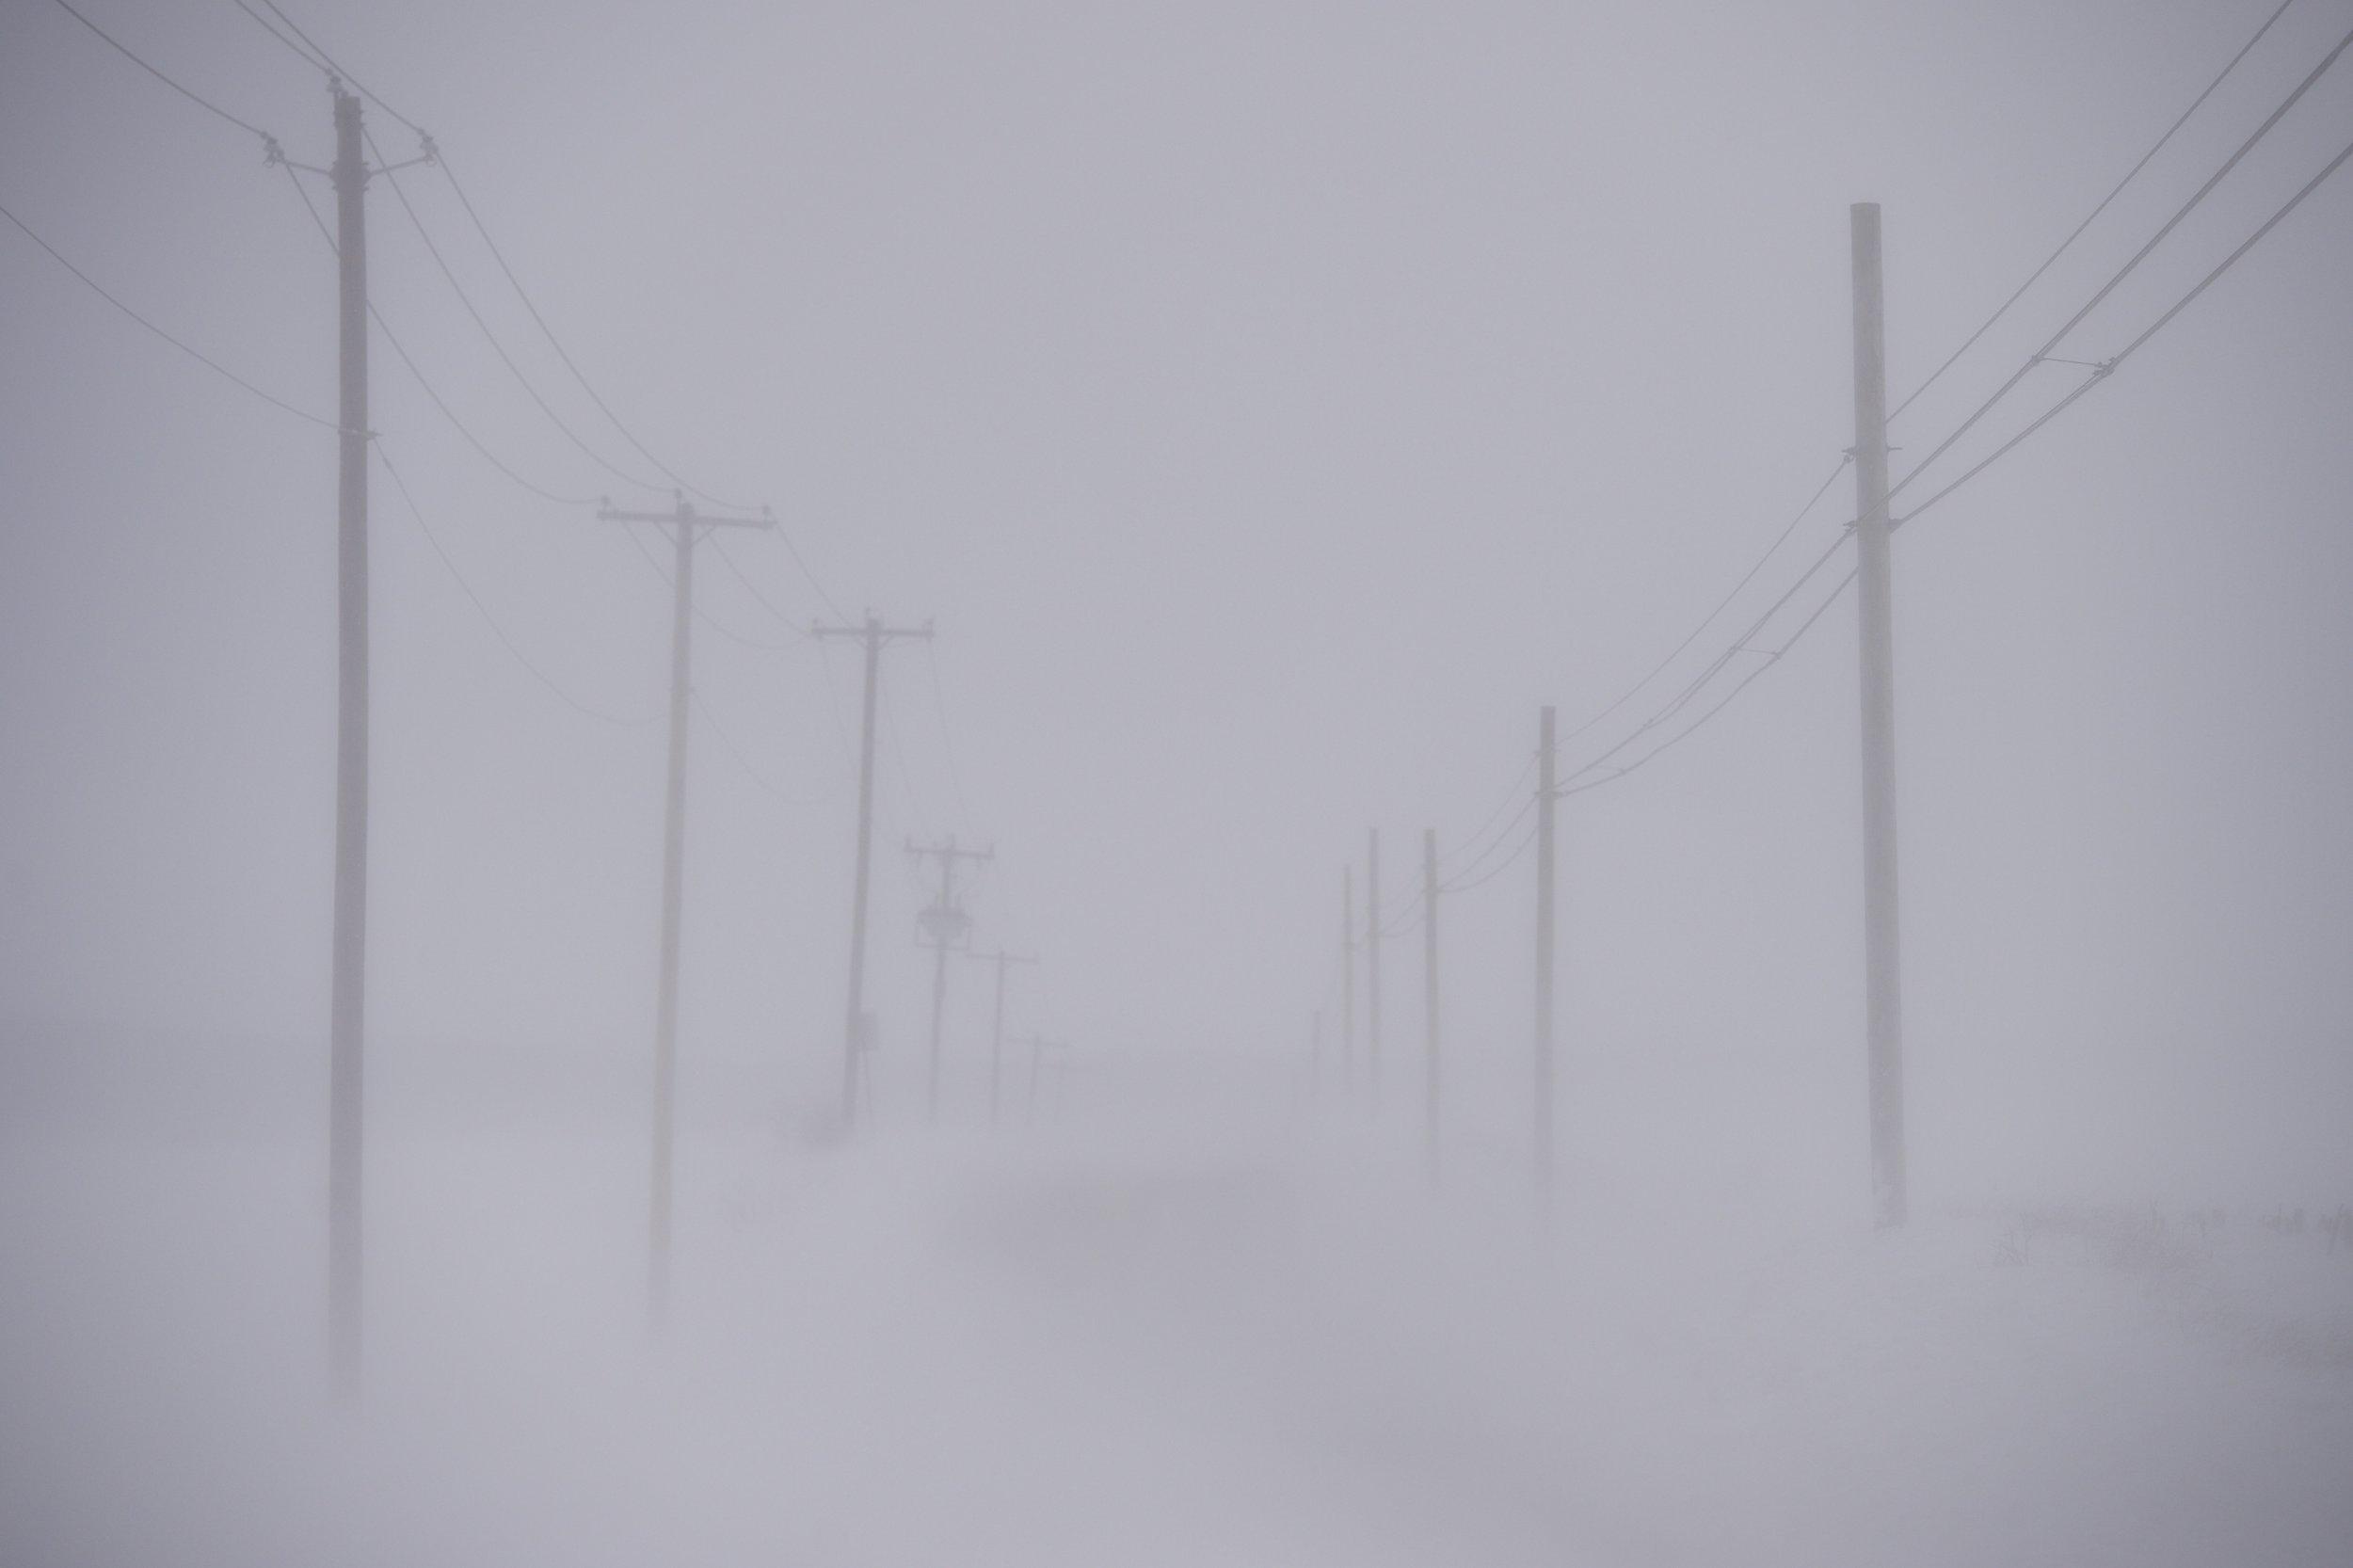 01_03_blizzard_conditions_northeast